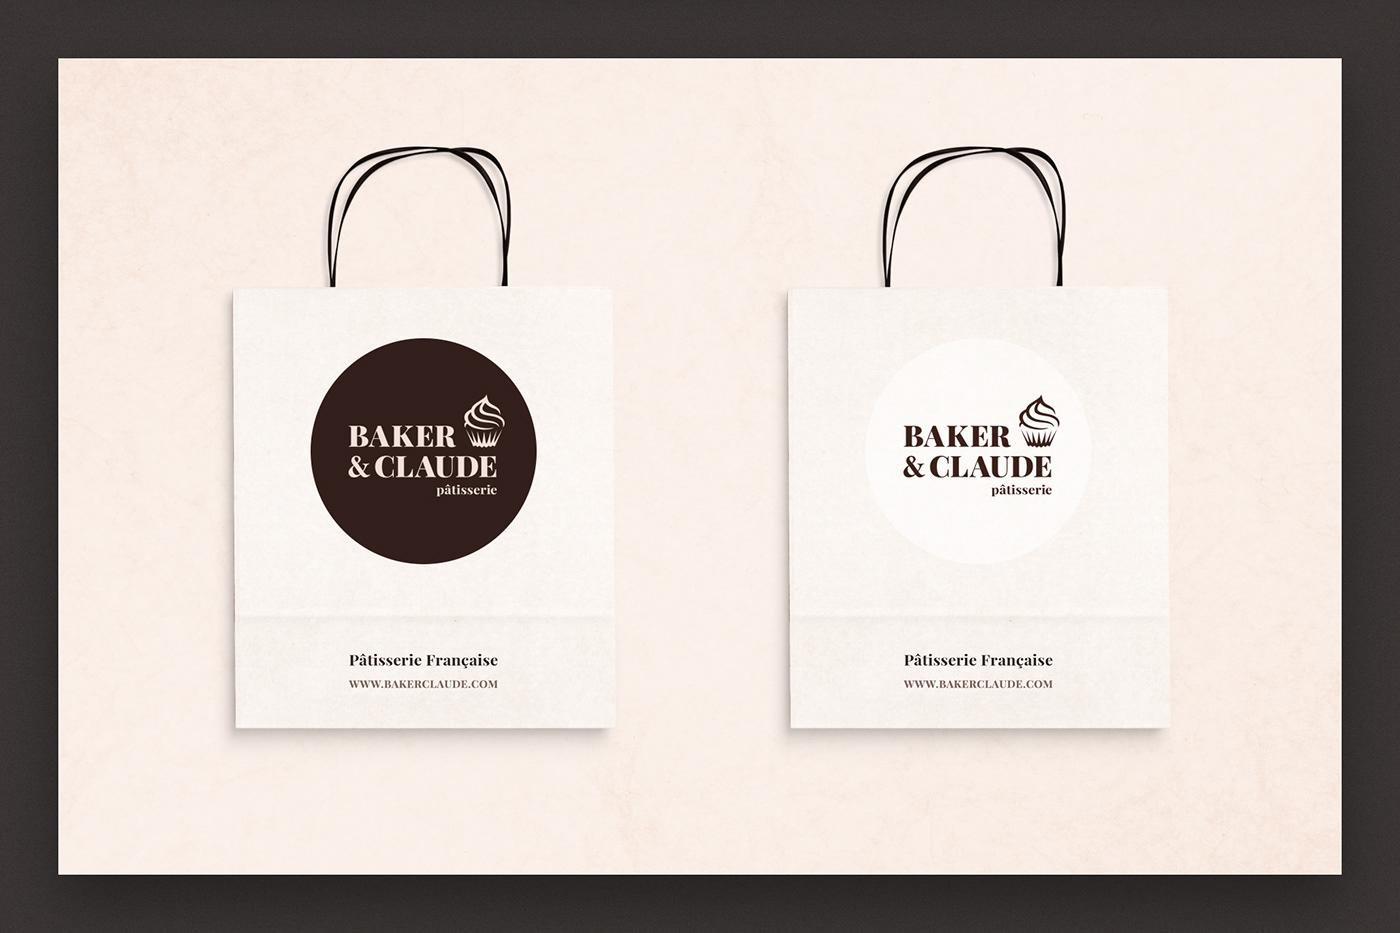 Logotype Logo Design Packaging bag pastry graphic design  identity brand print design  logo